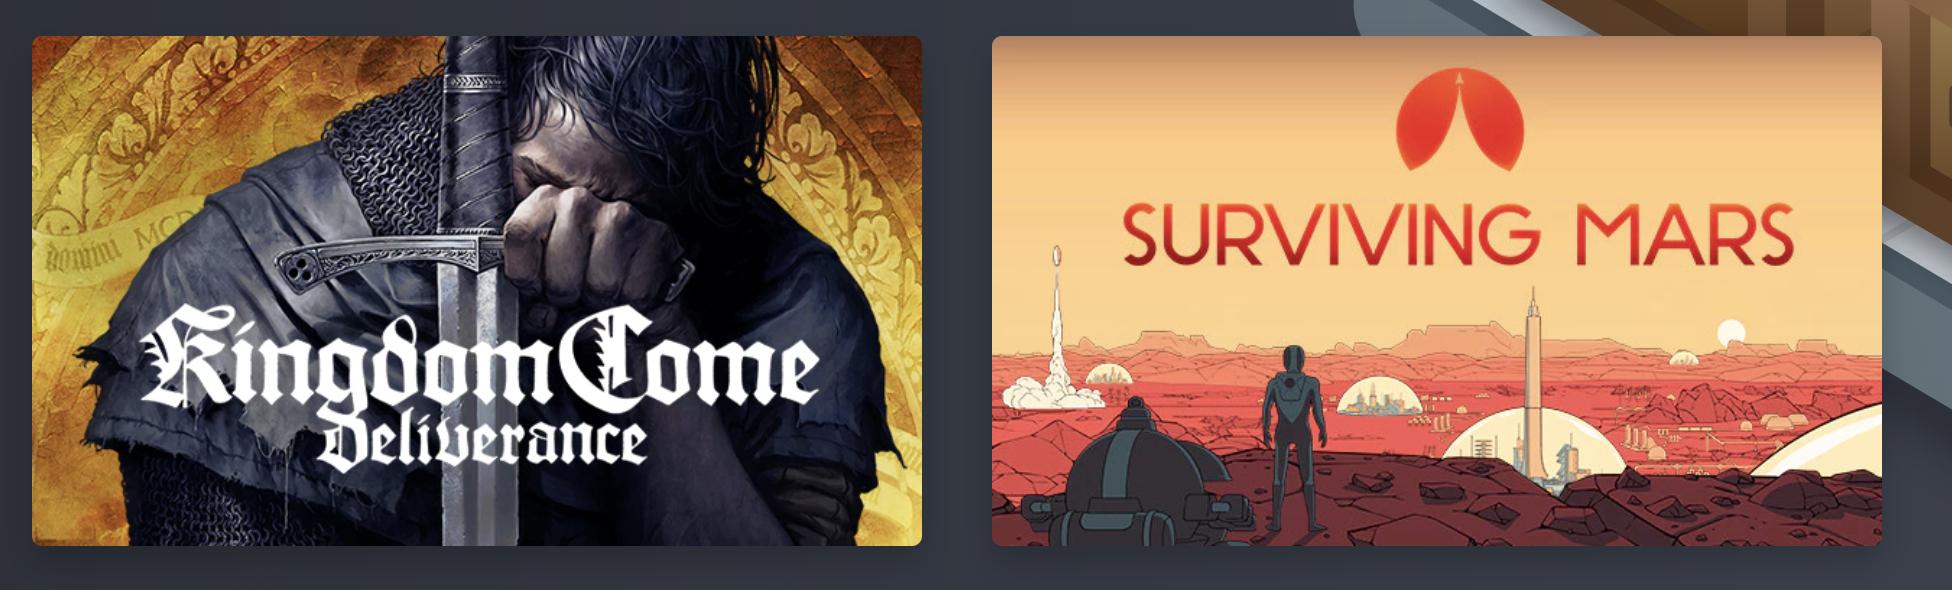 Humble Monthly - Kingdom Come: Deliverance + Surviving Mars (Steam) £9.50